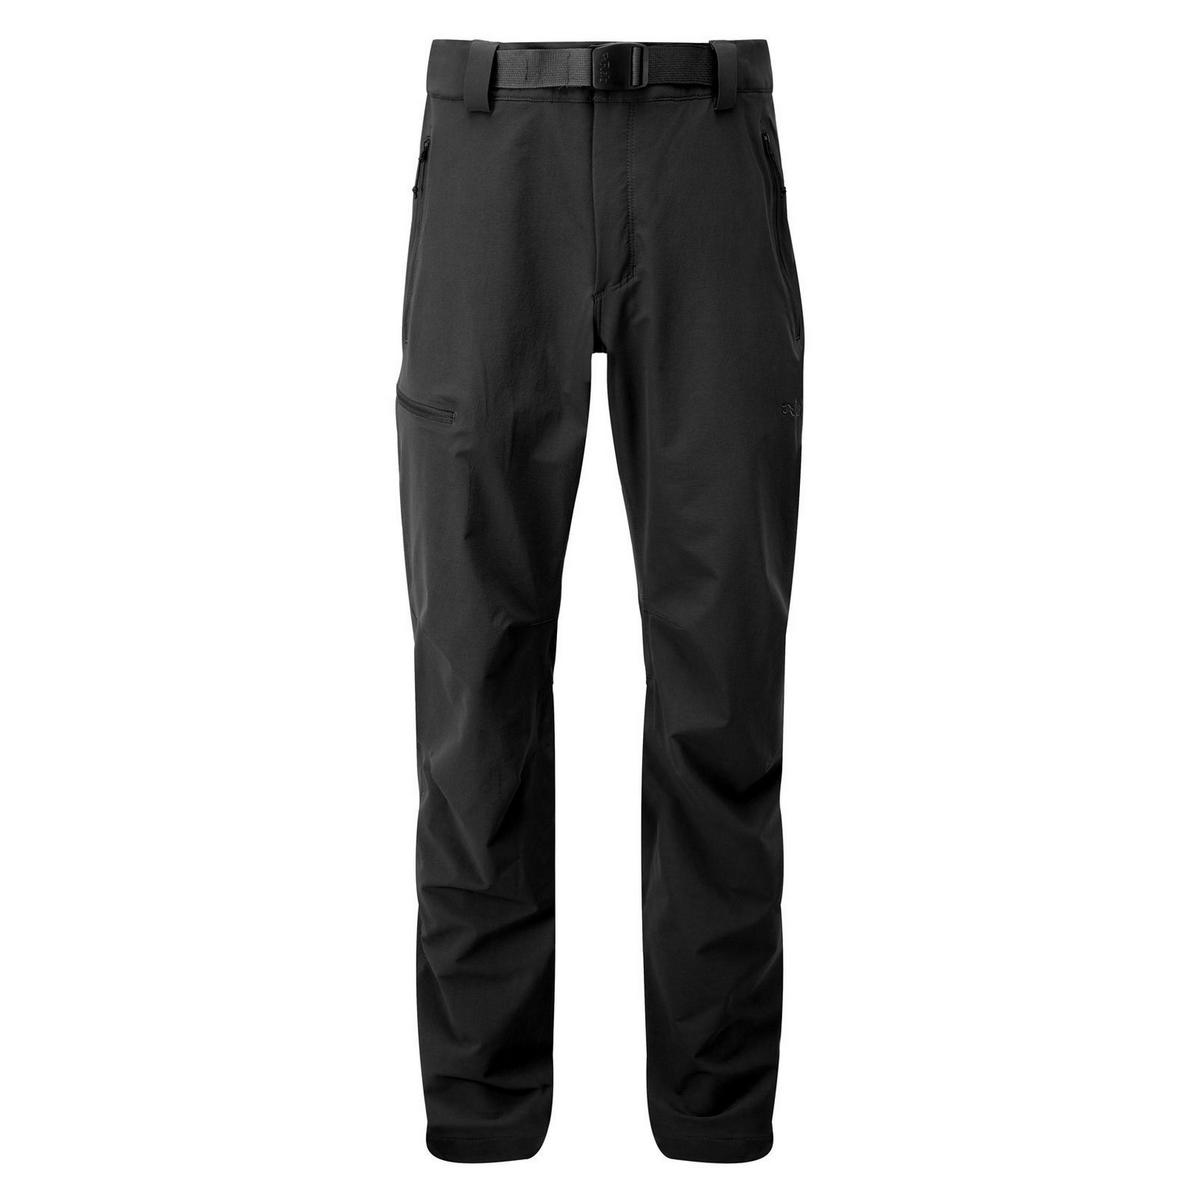 Rab Men's Vector Pants Short